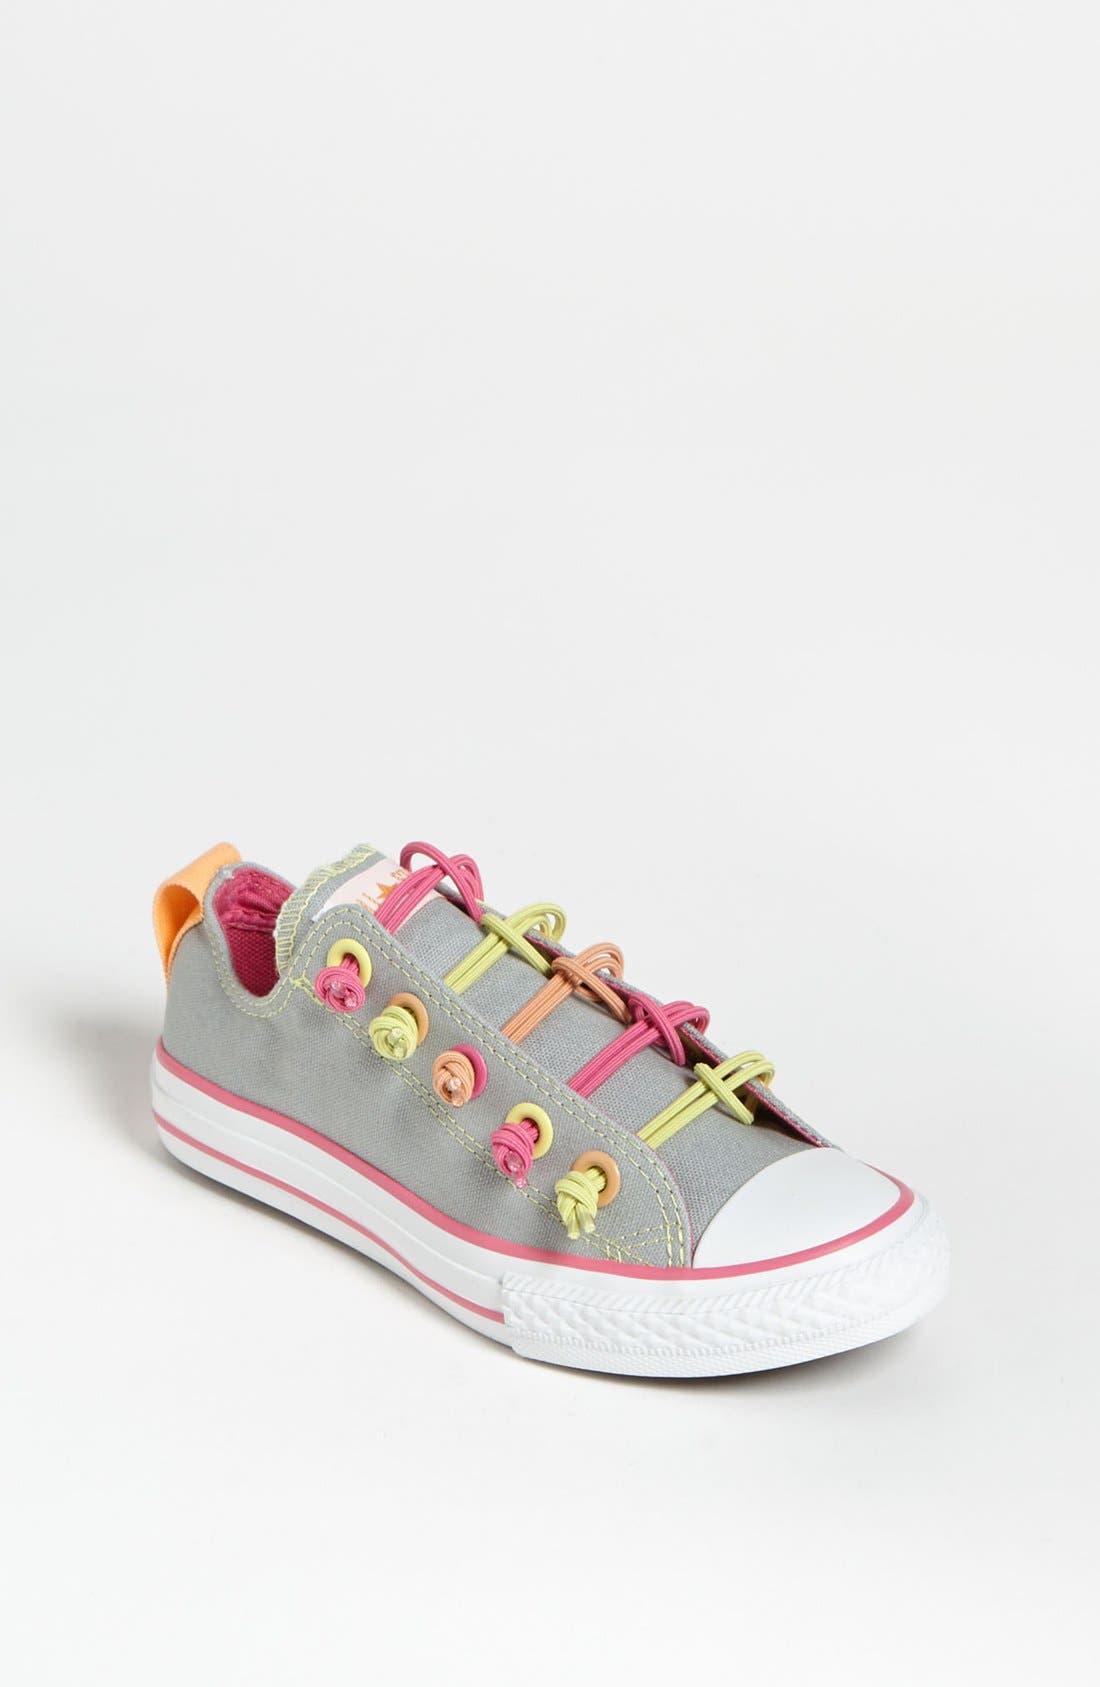 Main Image - Converse All Star® 'Loop 2 Knot' Sneaker (Toddler, Little Kid & Big Kid)